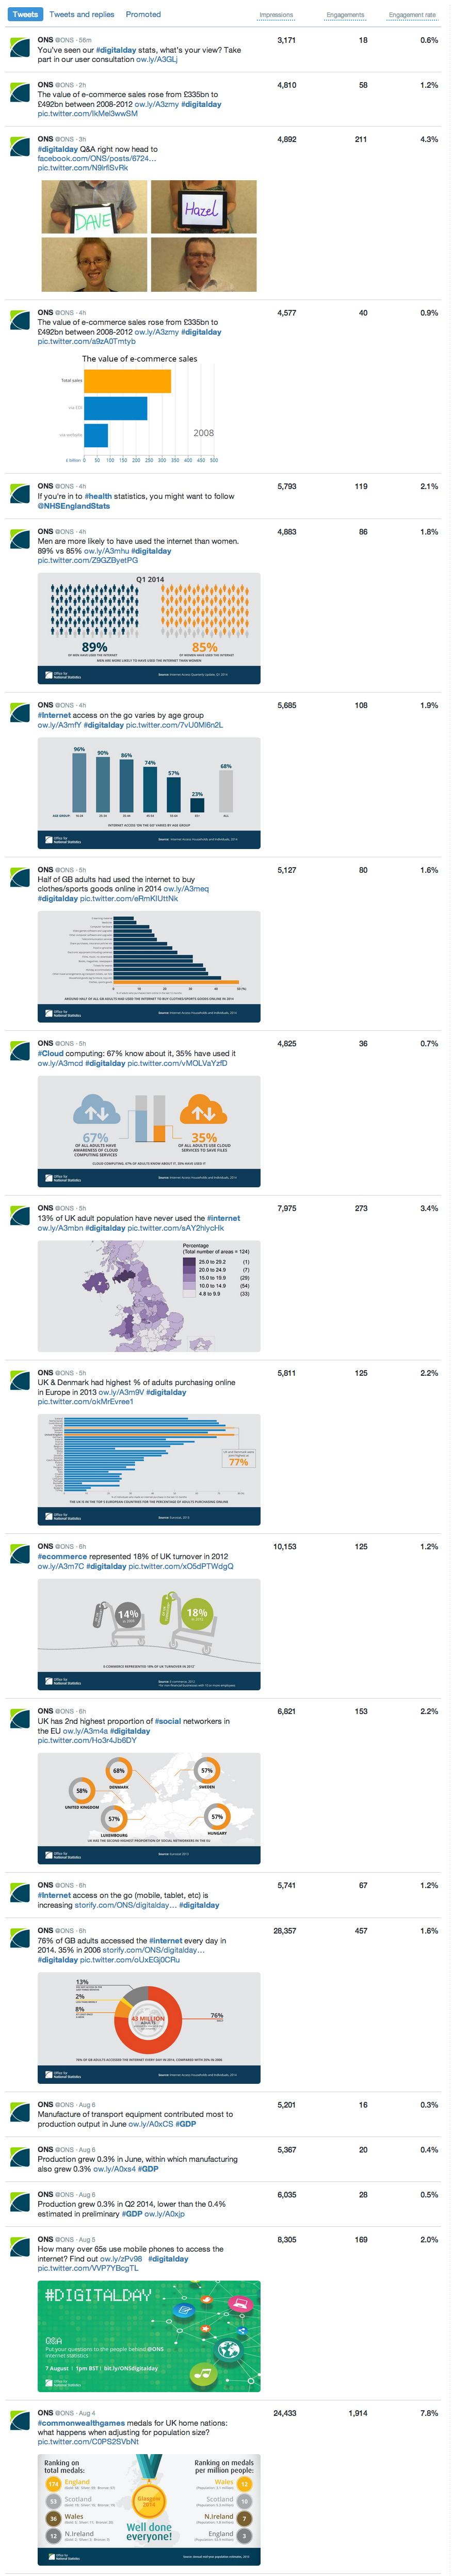 Tweet Activity analytics for ONS